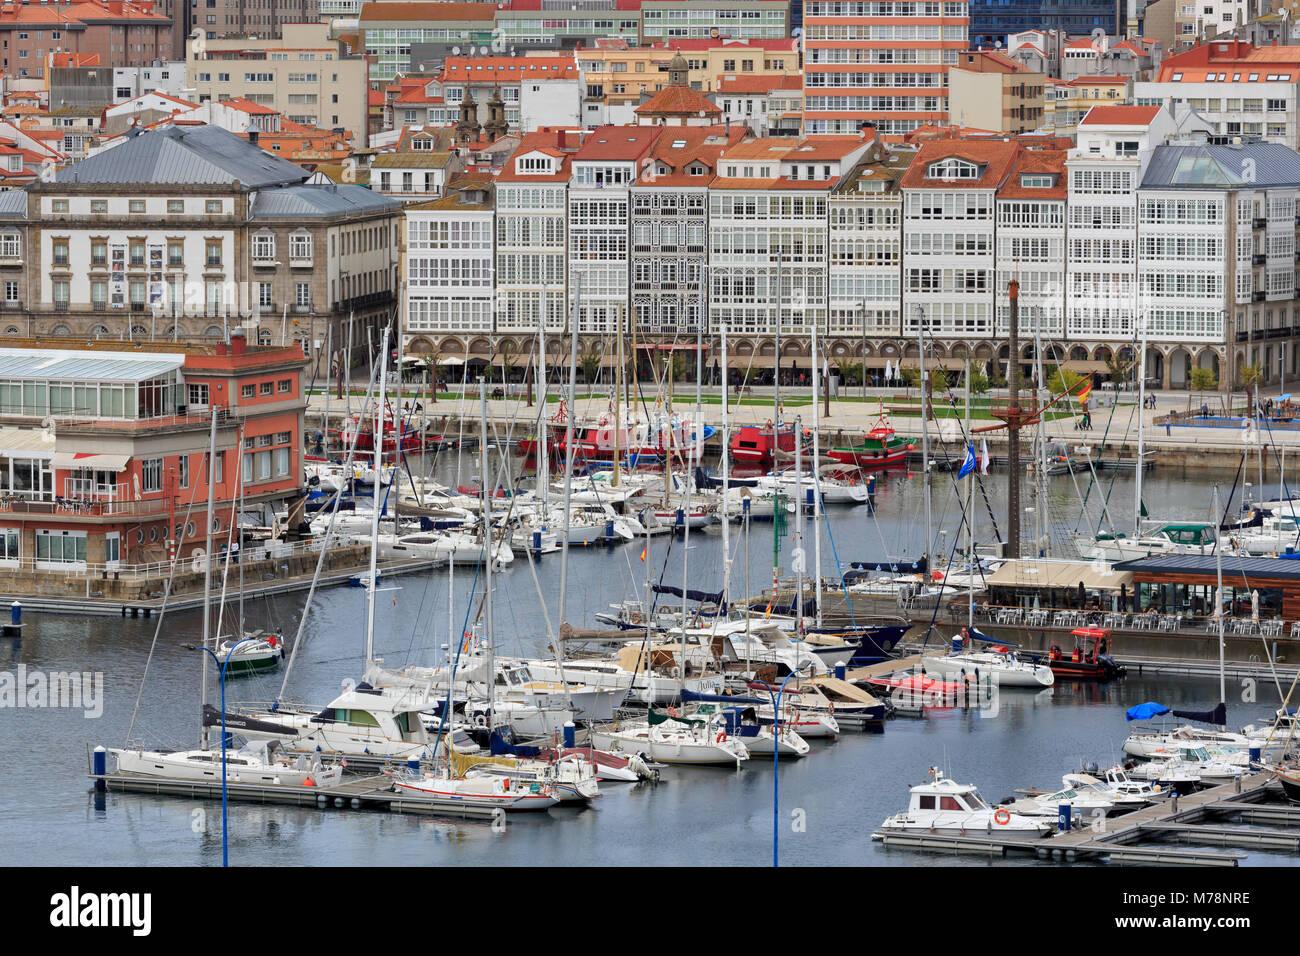 Yacht Marina, La Coruna City, Galizia, Spagna, Europa Immagini Stock